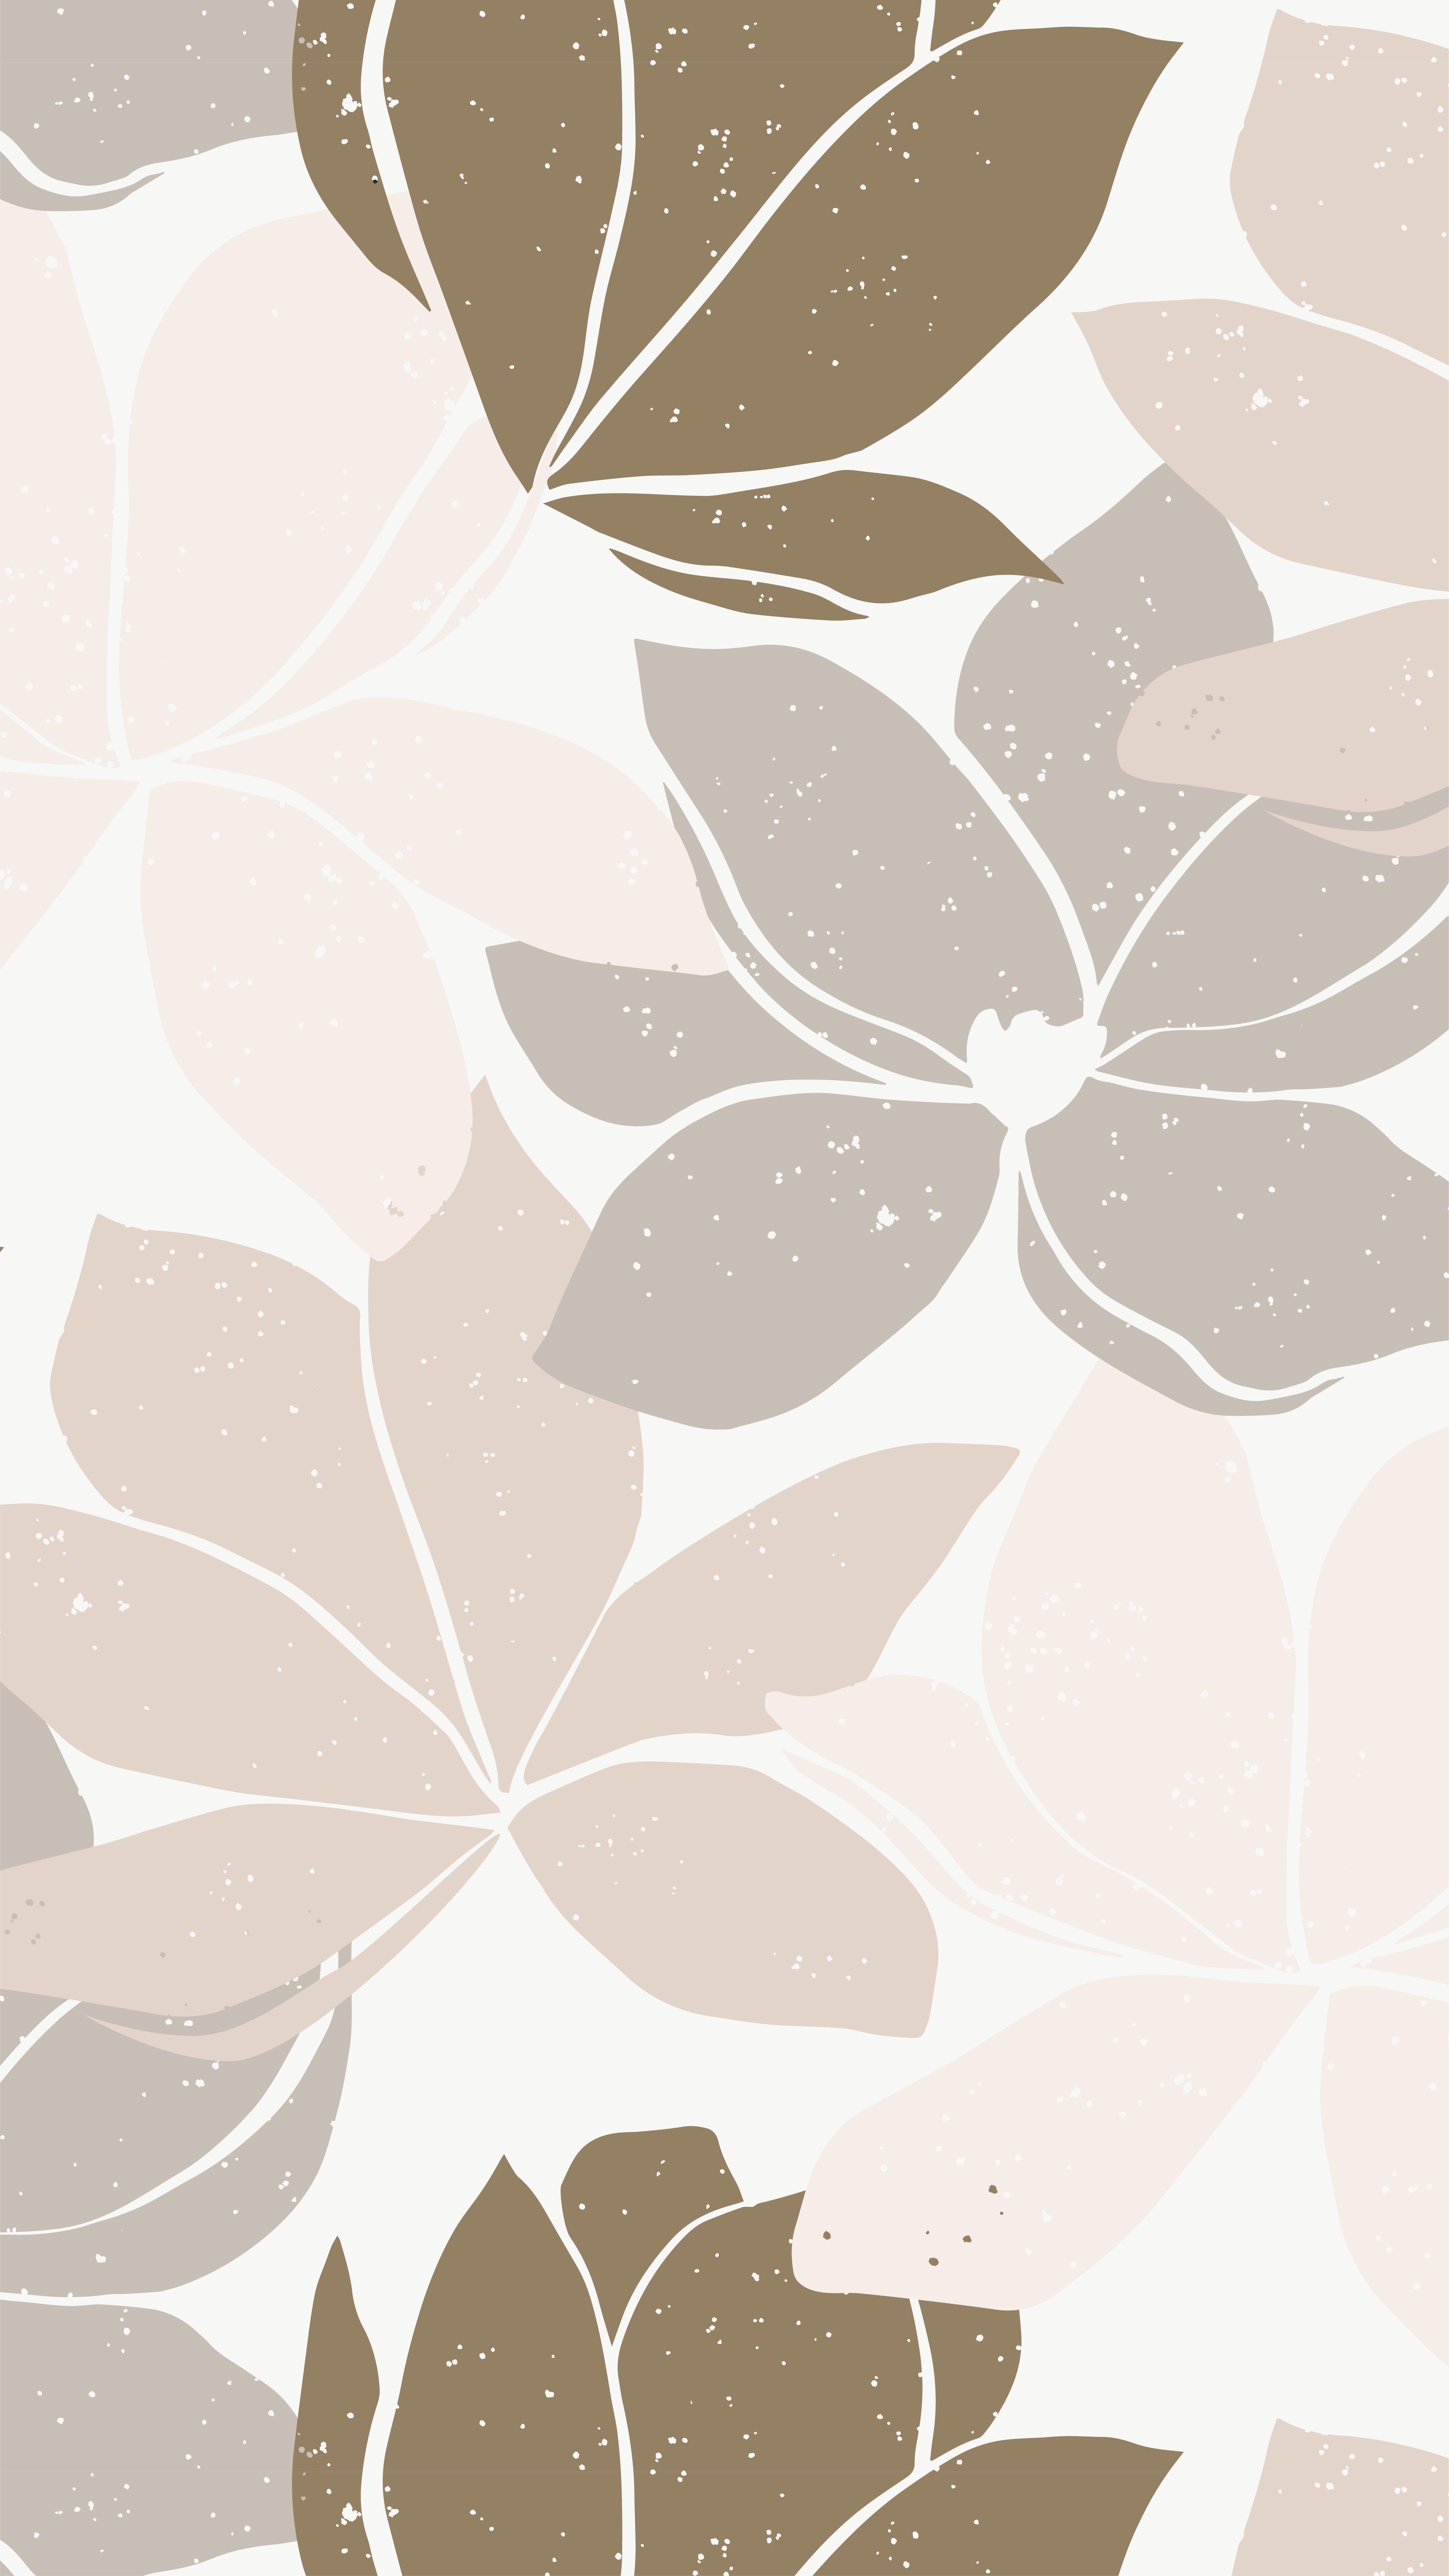 Floral feminine pattern design